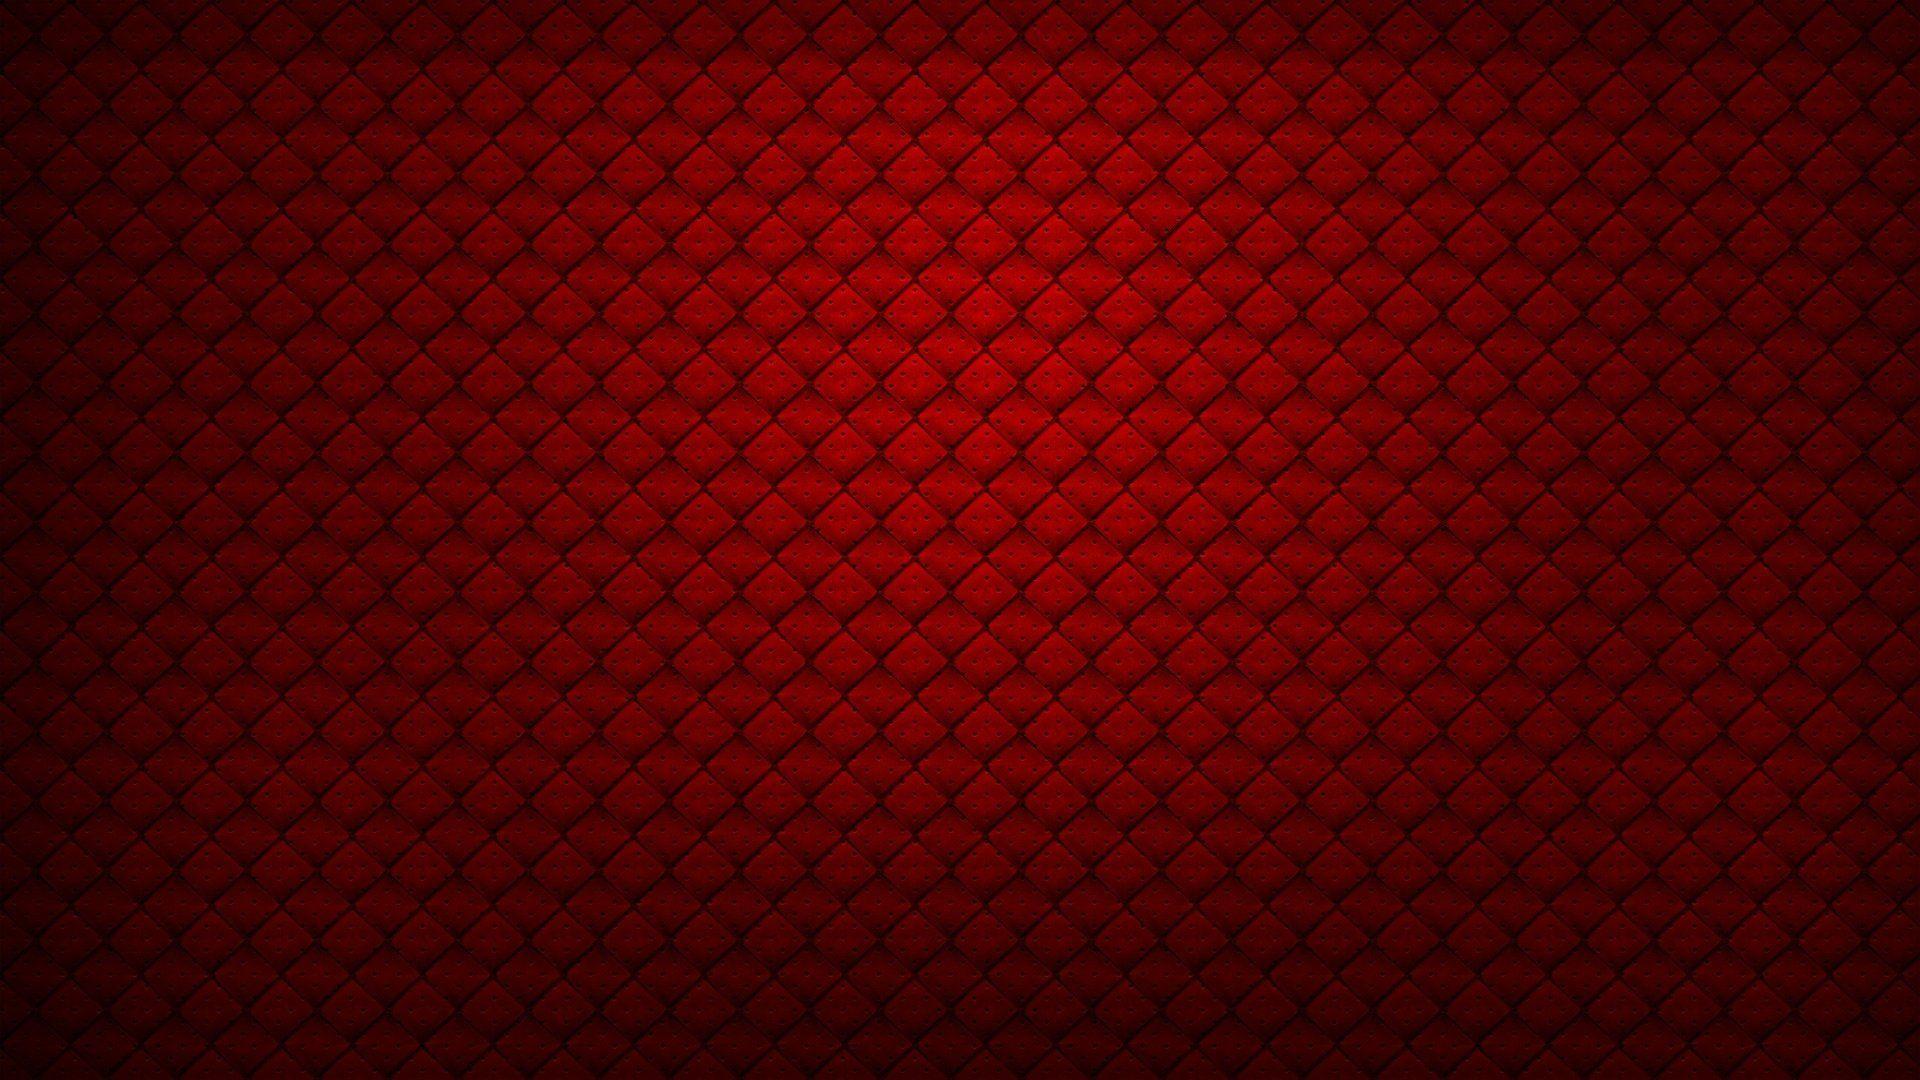 maroon abstract wallpapers top free maroon abstract backgrounds wallpaperaccess maroon abstract wallpapers top free